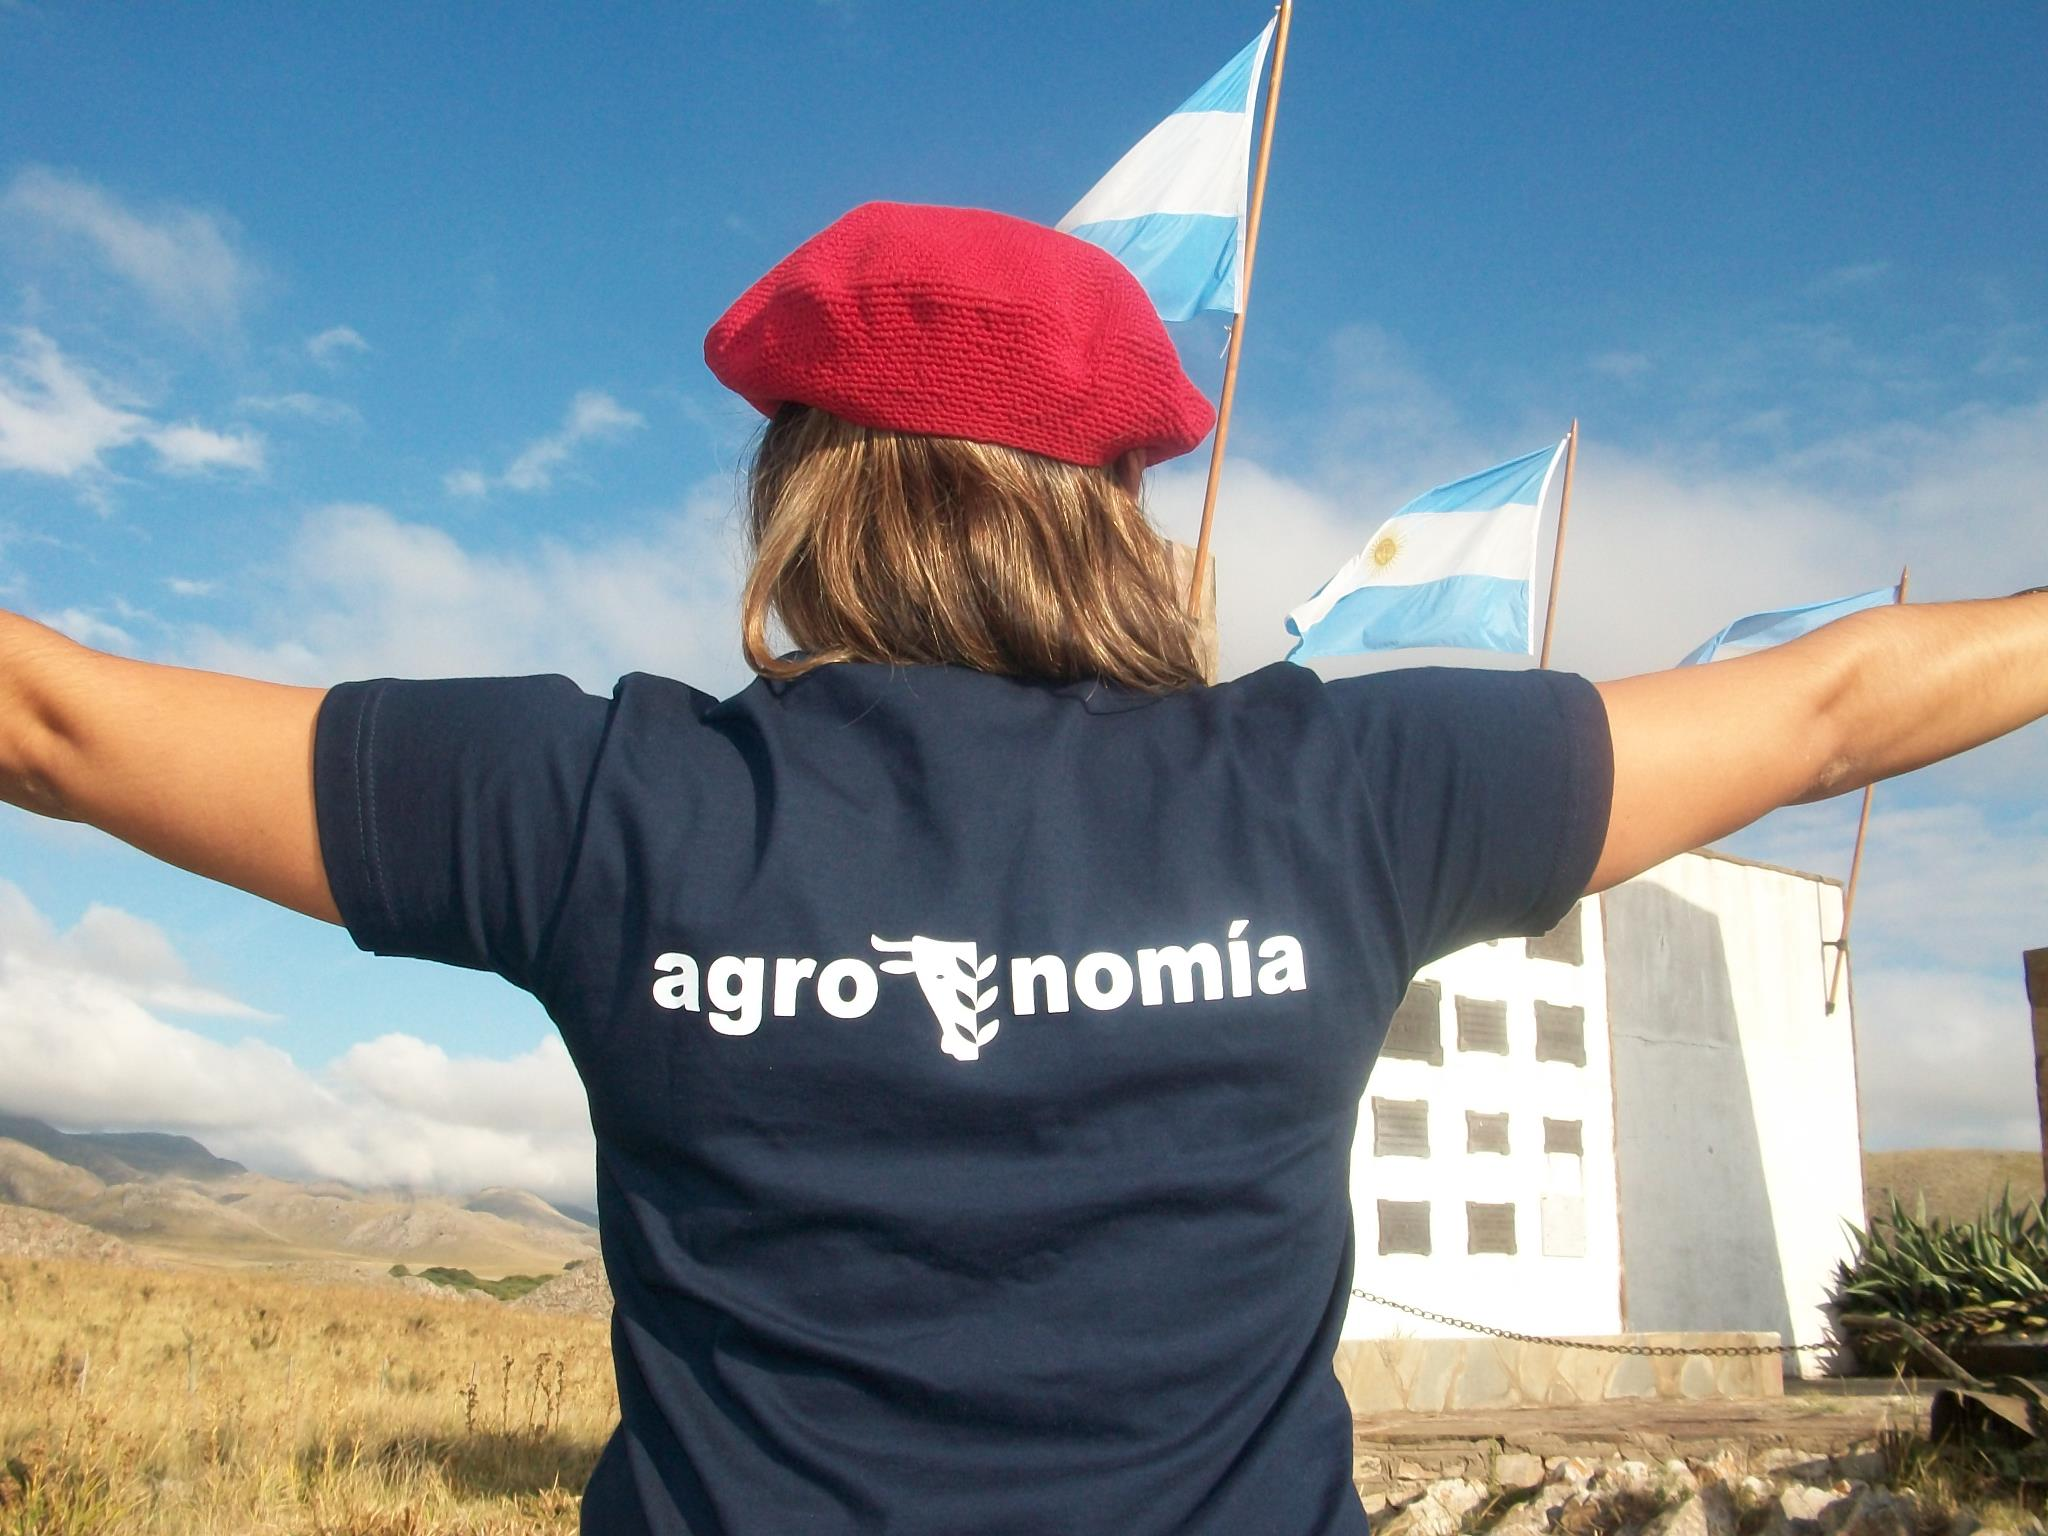 Agronomía - Remera